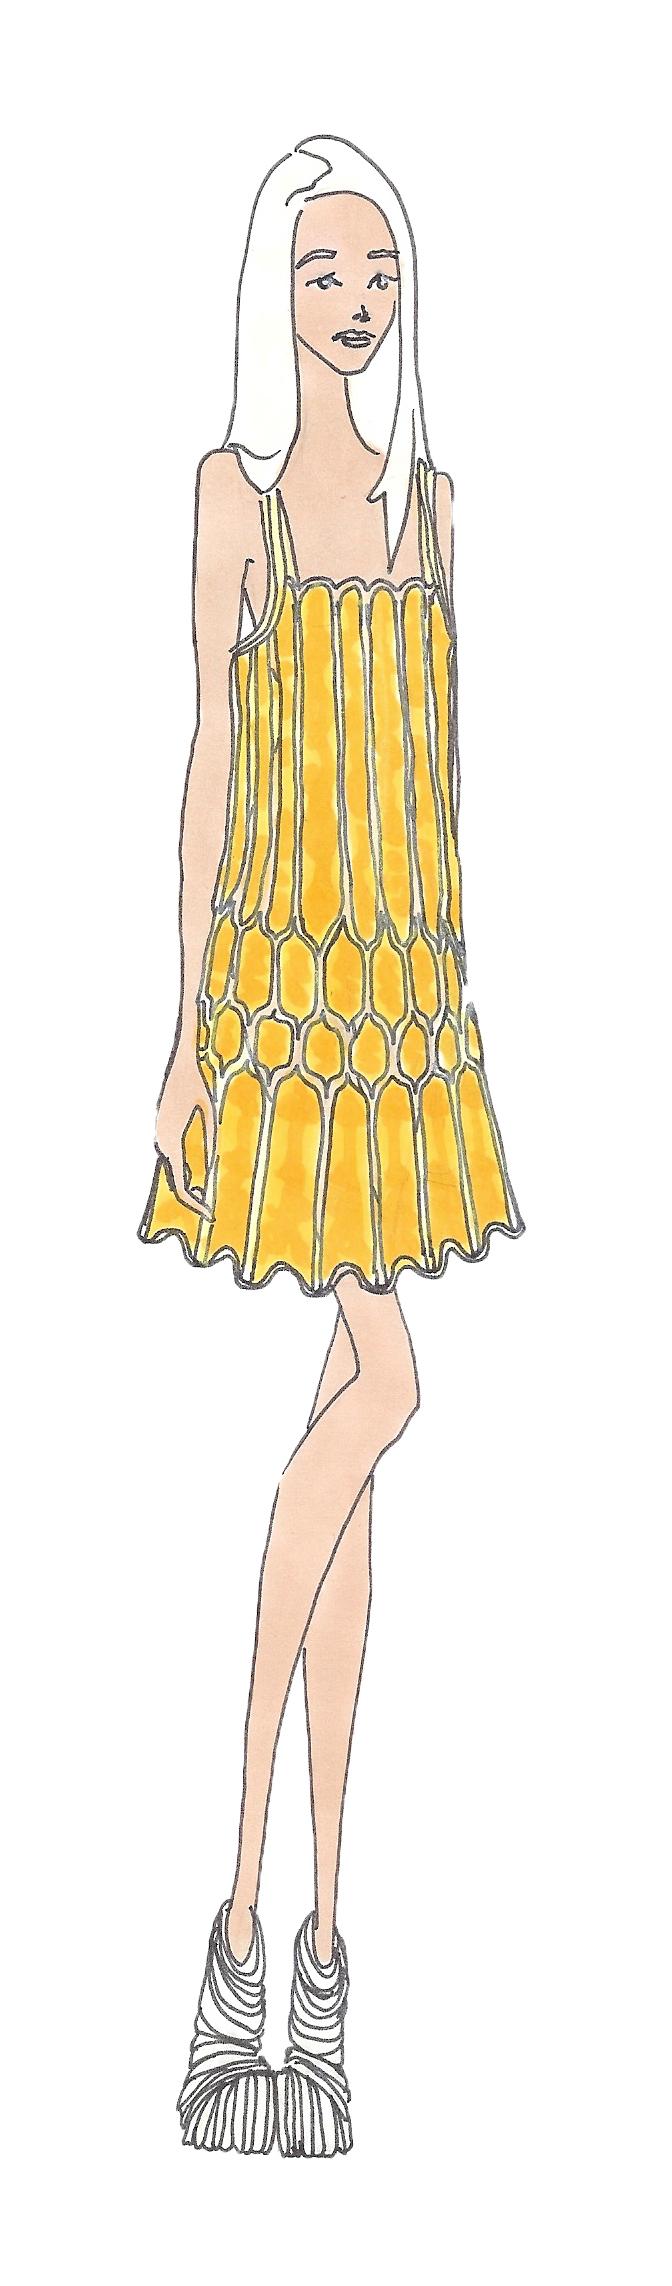 1P2013 Erika Drawings-0032.jpg